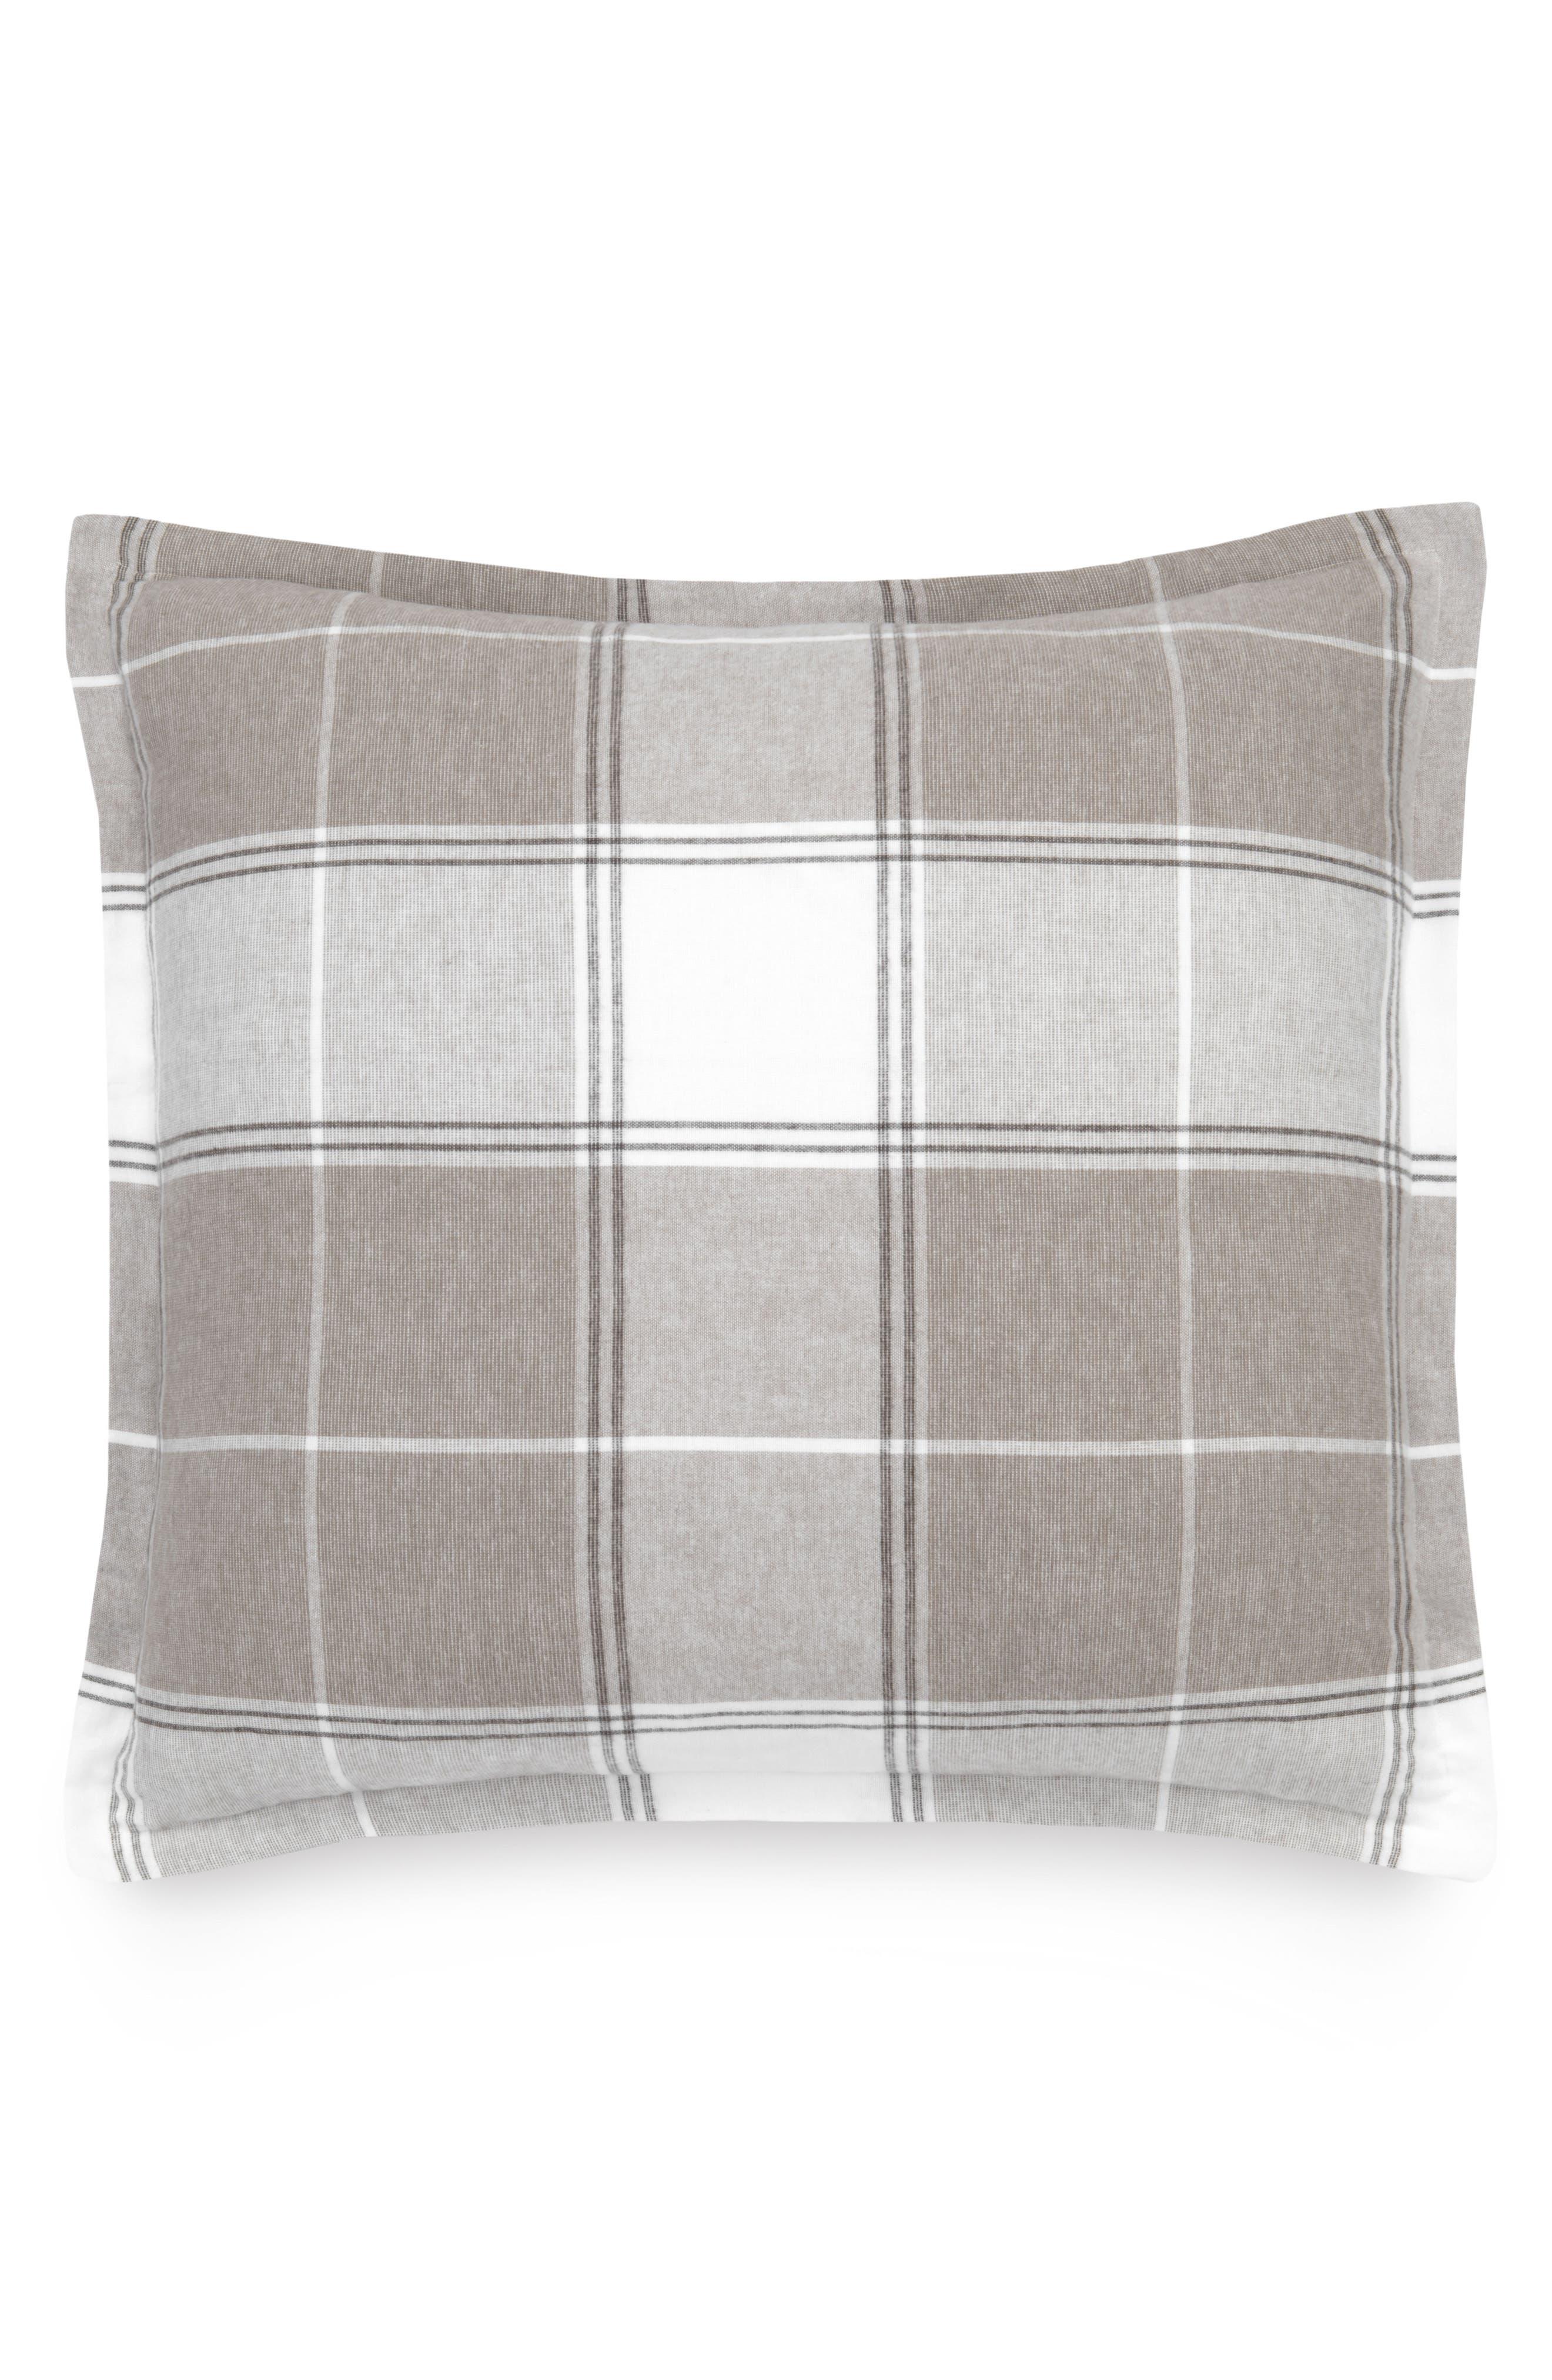 UGG® Flannel Luxe Euro Sham